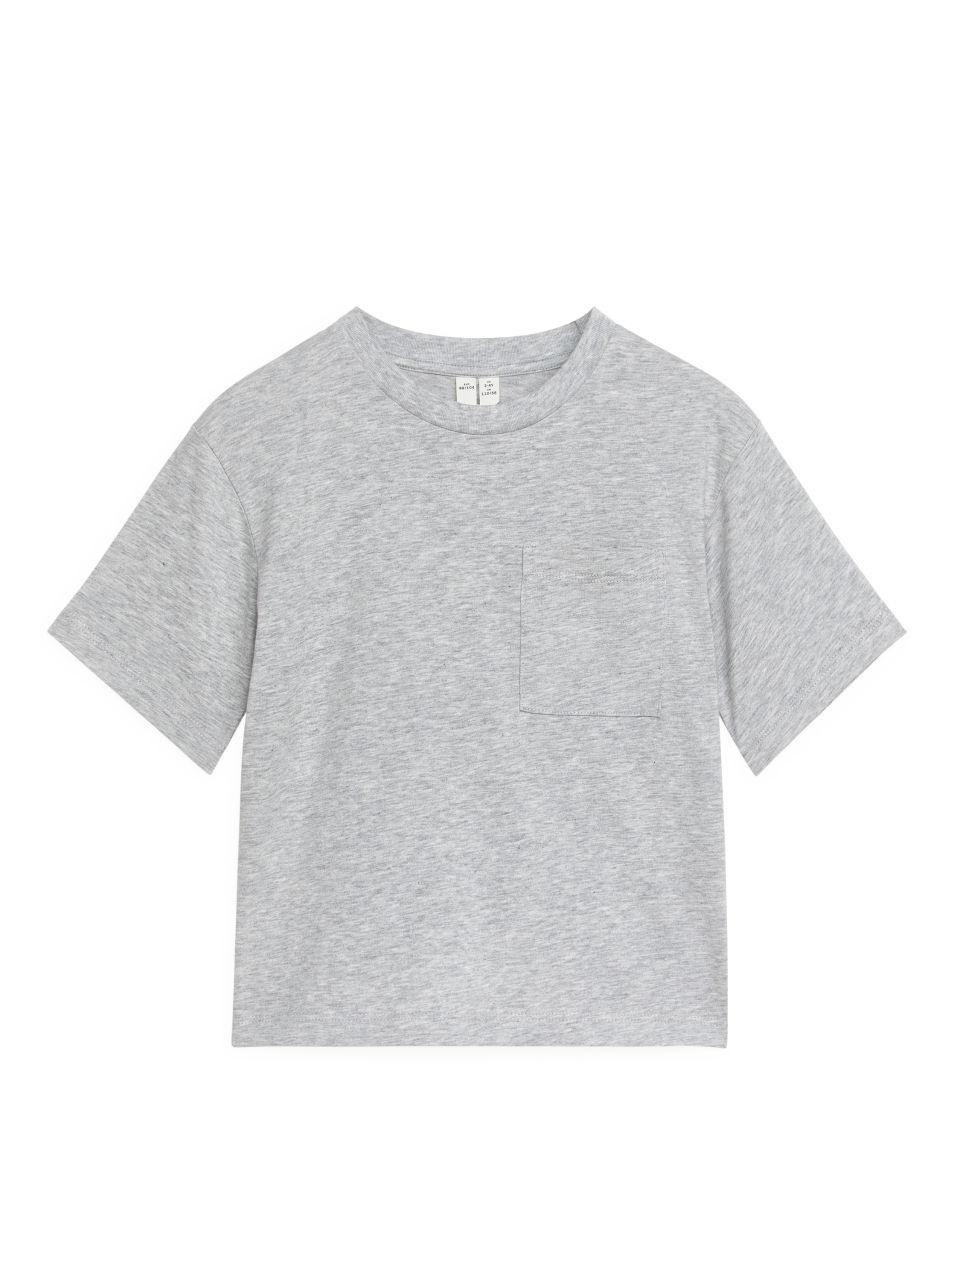 Loose Fit T-Shirt - Grey